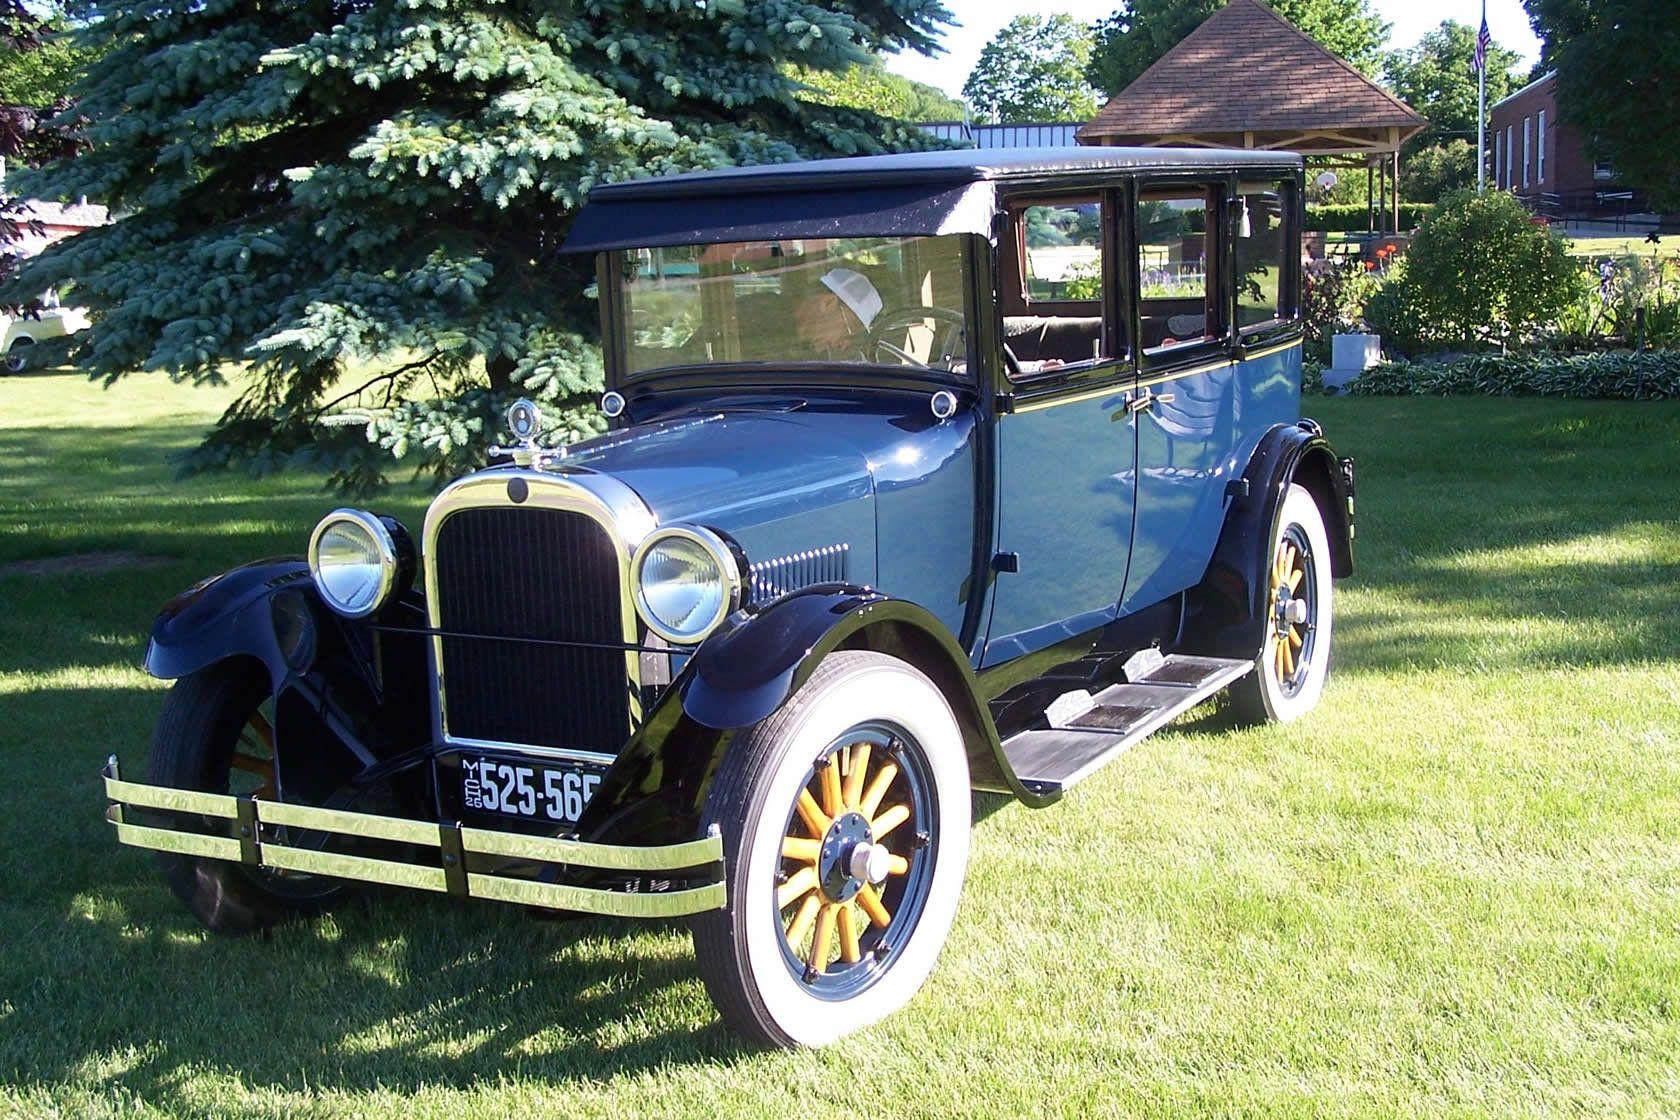 1926 Dodge Sedan Cars Of Yester Year Pinterest Dodge Cars And